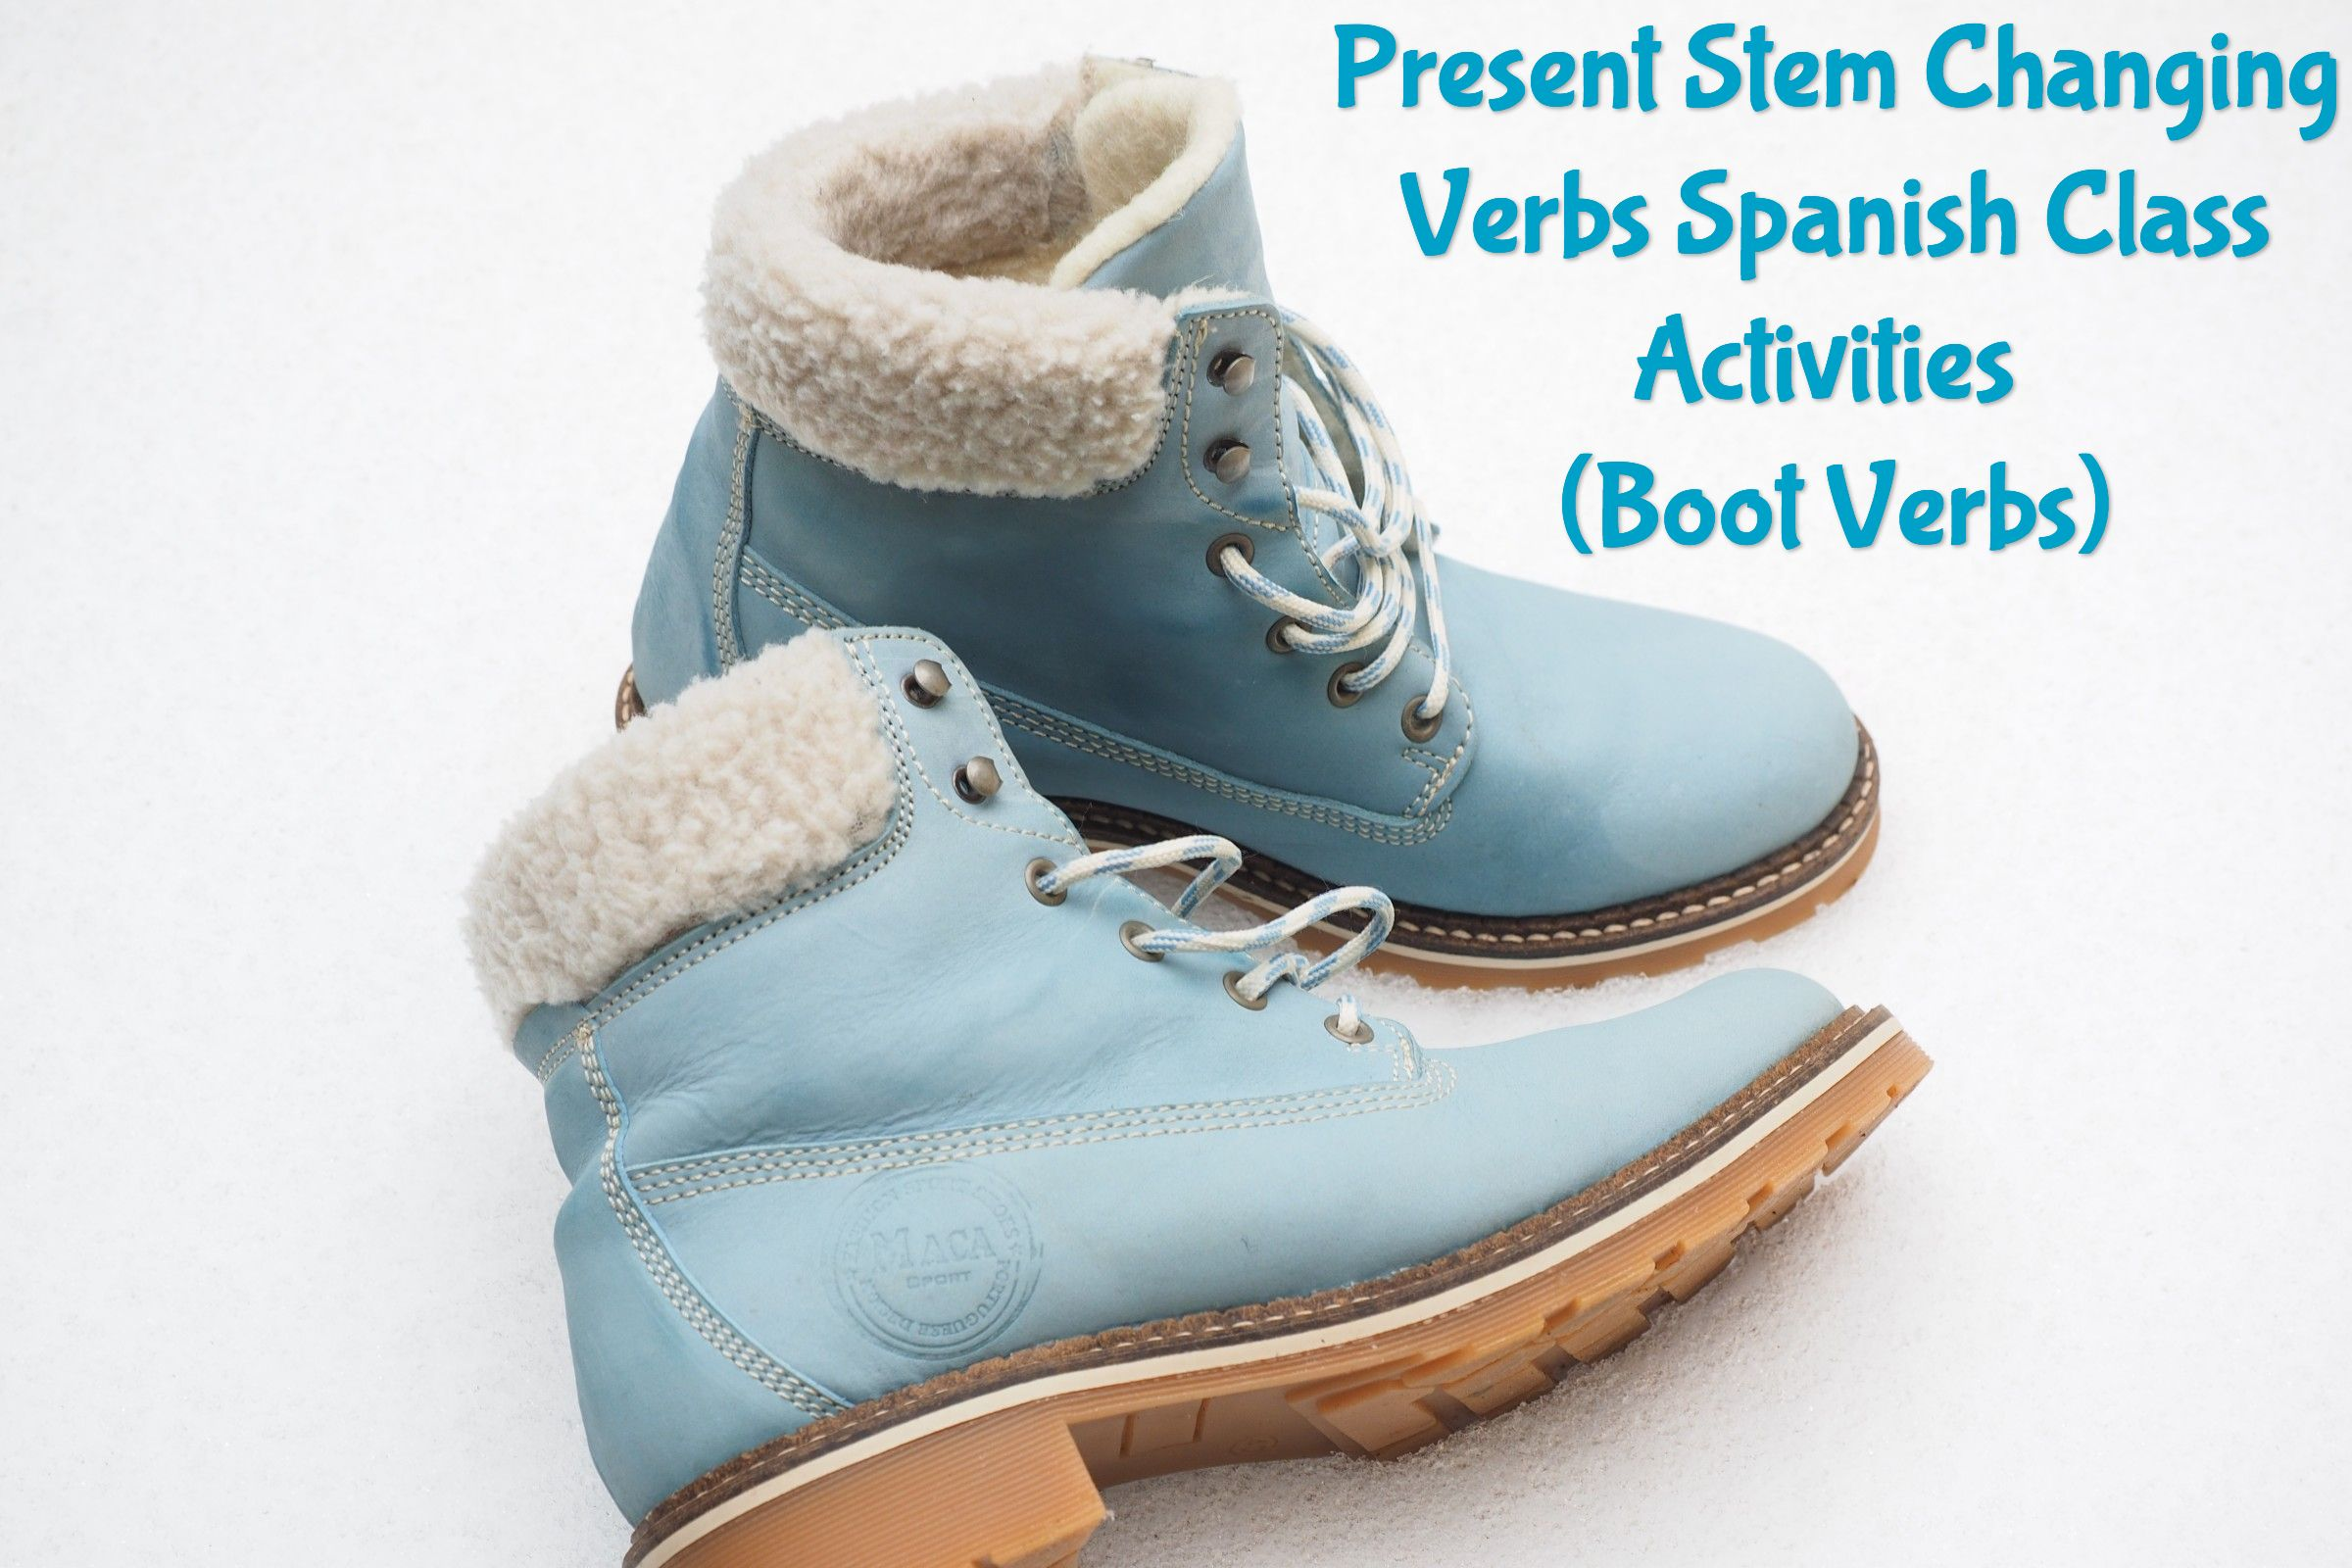 Present Stem Changing Verbs Spanish Class Activities Boot